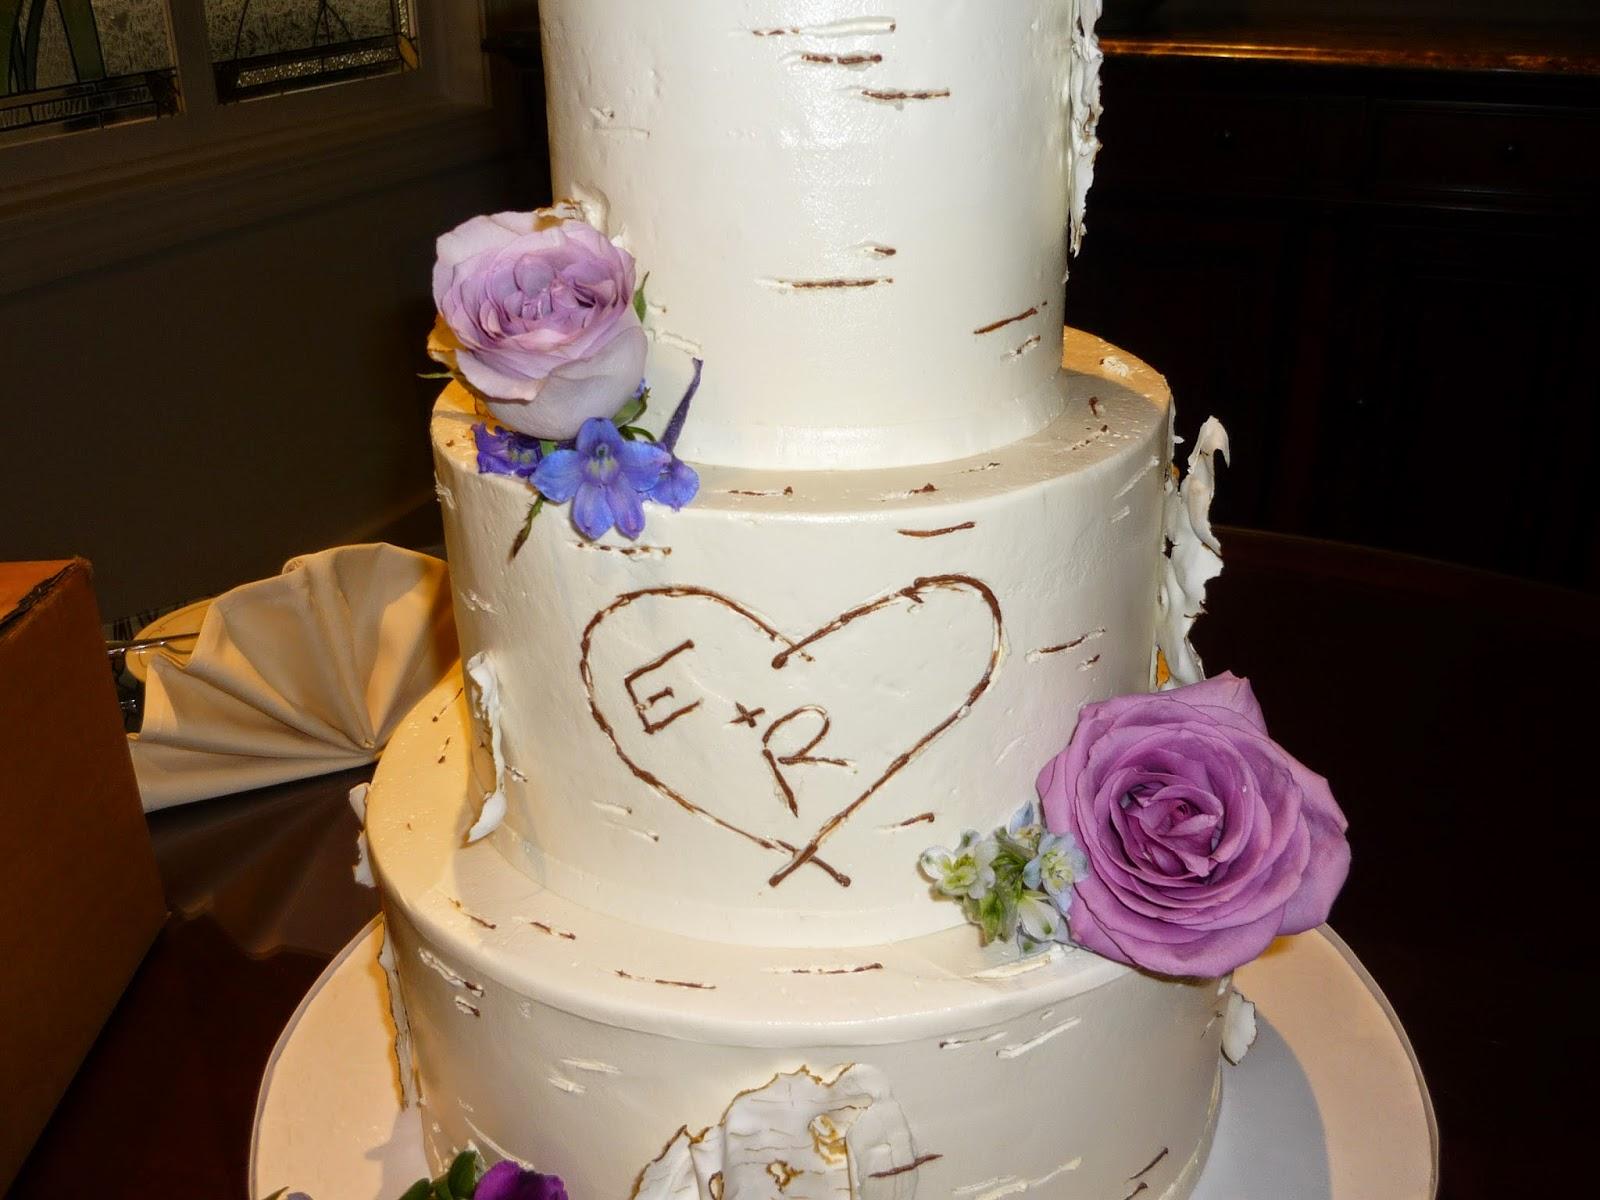 Artisan Bake Shop: Independence Harbor, Weddings, Assonet, MA